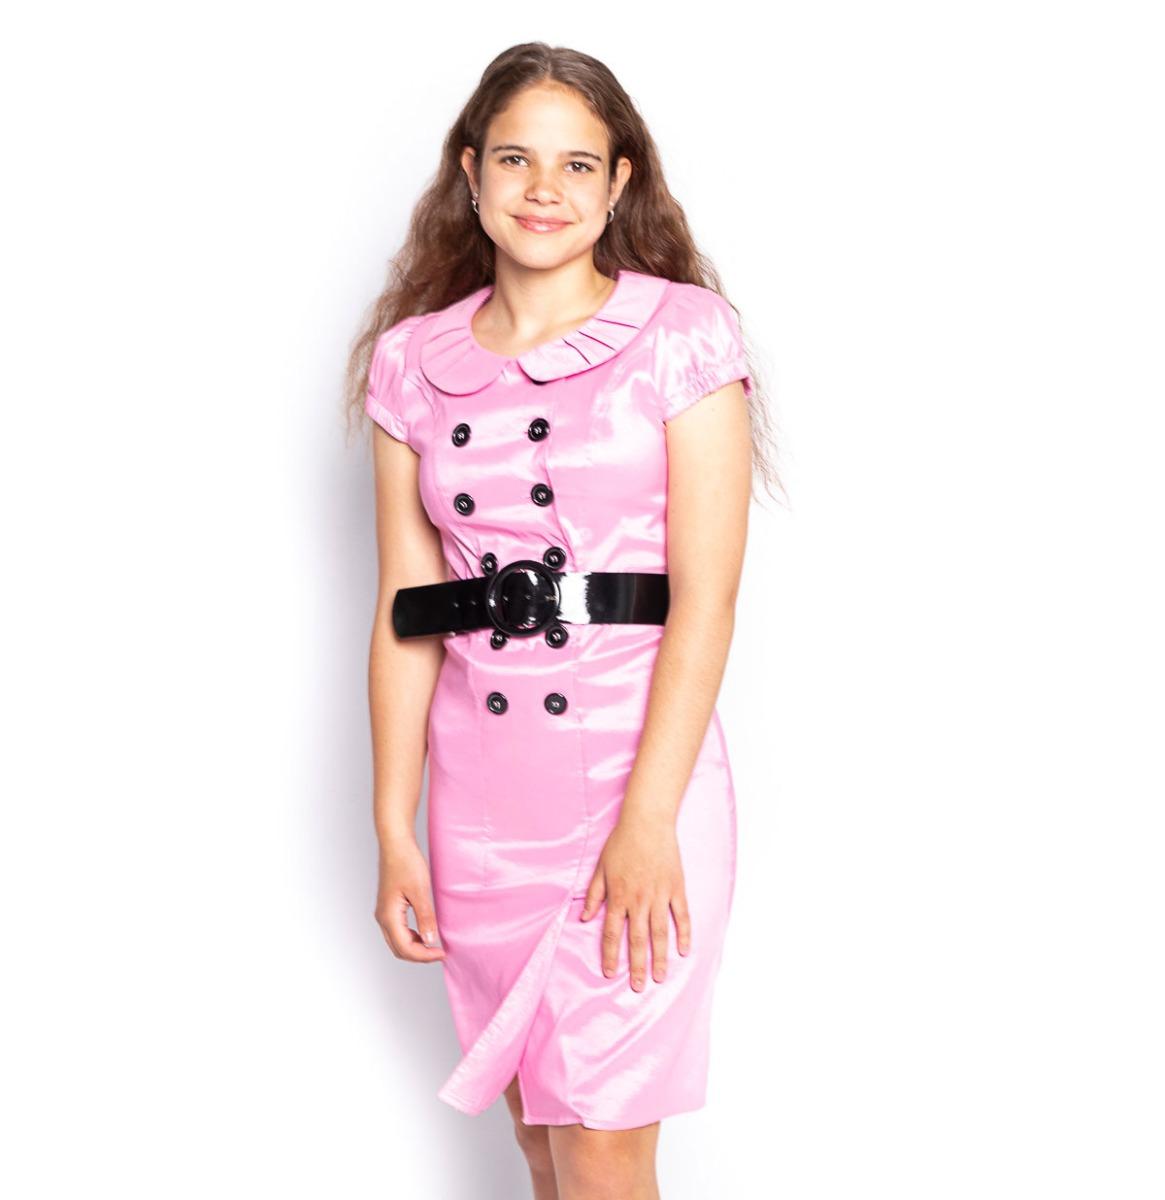 Vintage Roze Jurk Met Knopen - M